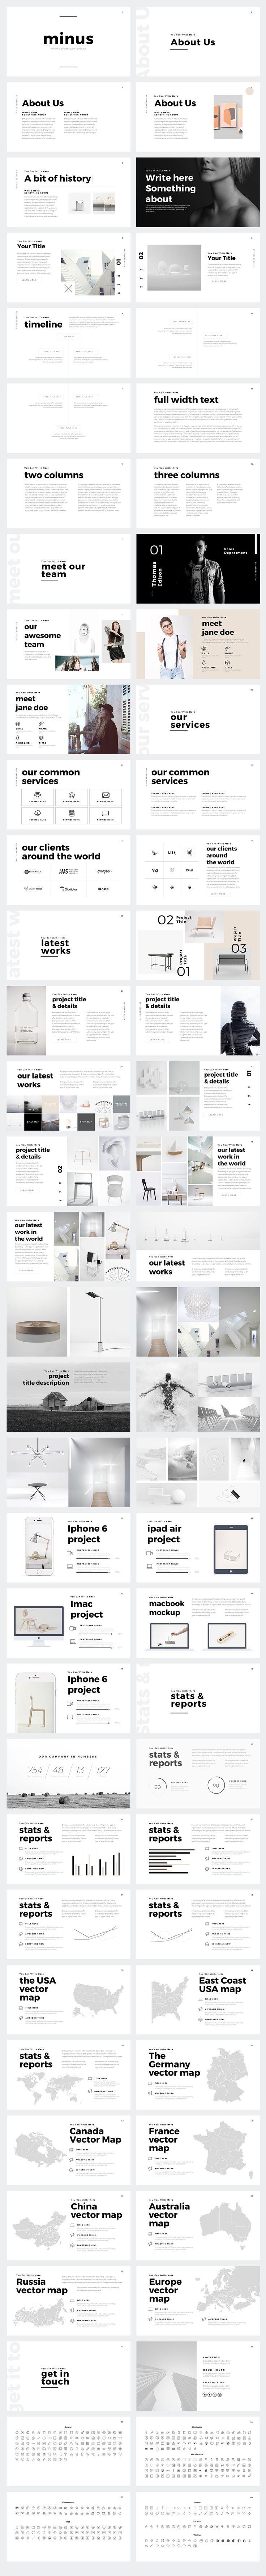 56 best presentation design inspiration images on pinterest page minus minimal powerpoint template toneelgroepblik Images